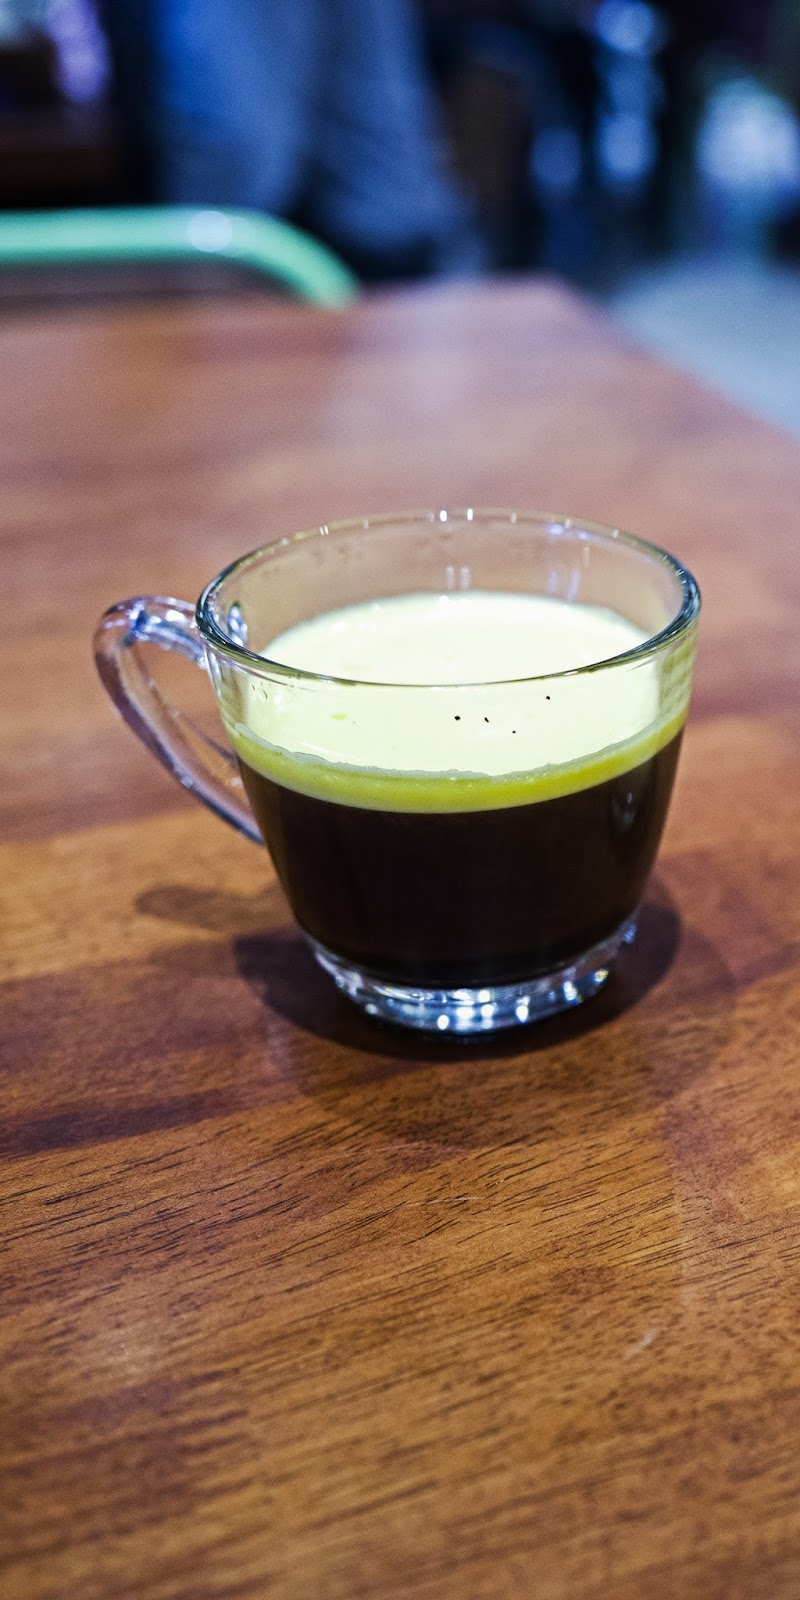 d-coffee-L1060495.jpg